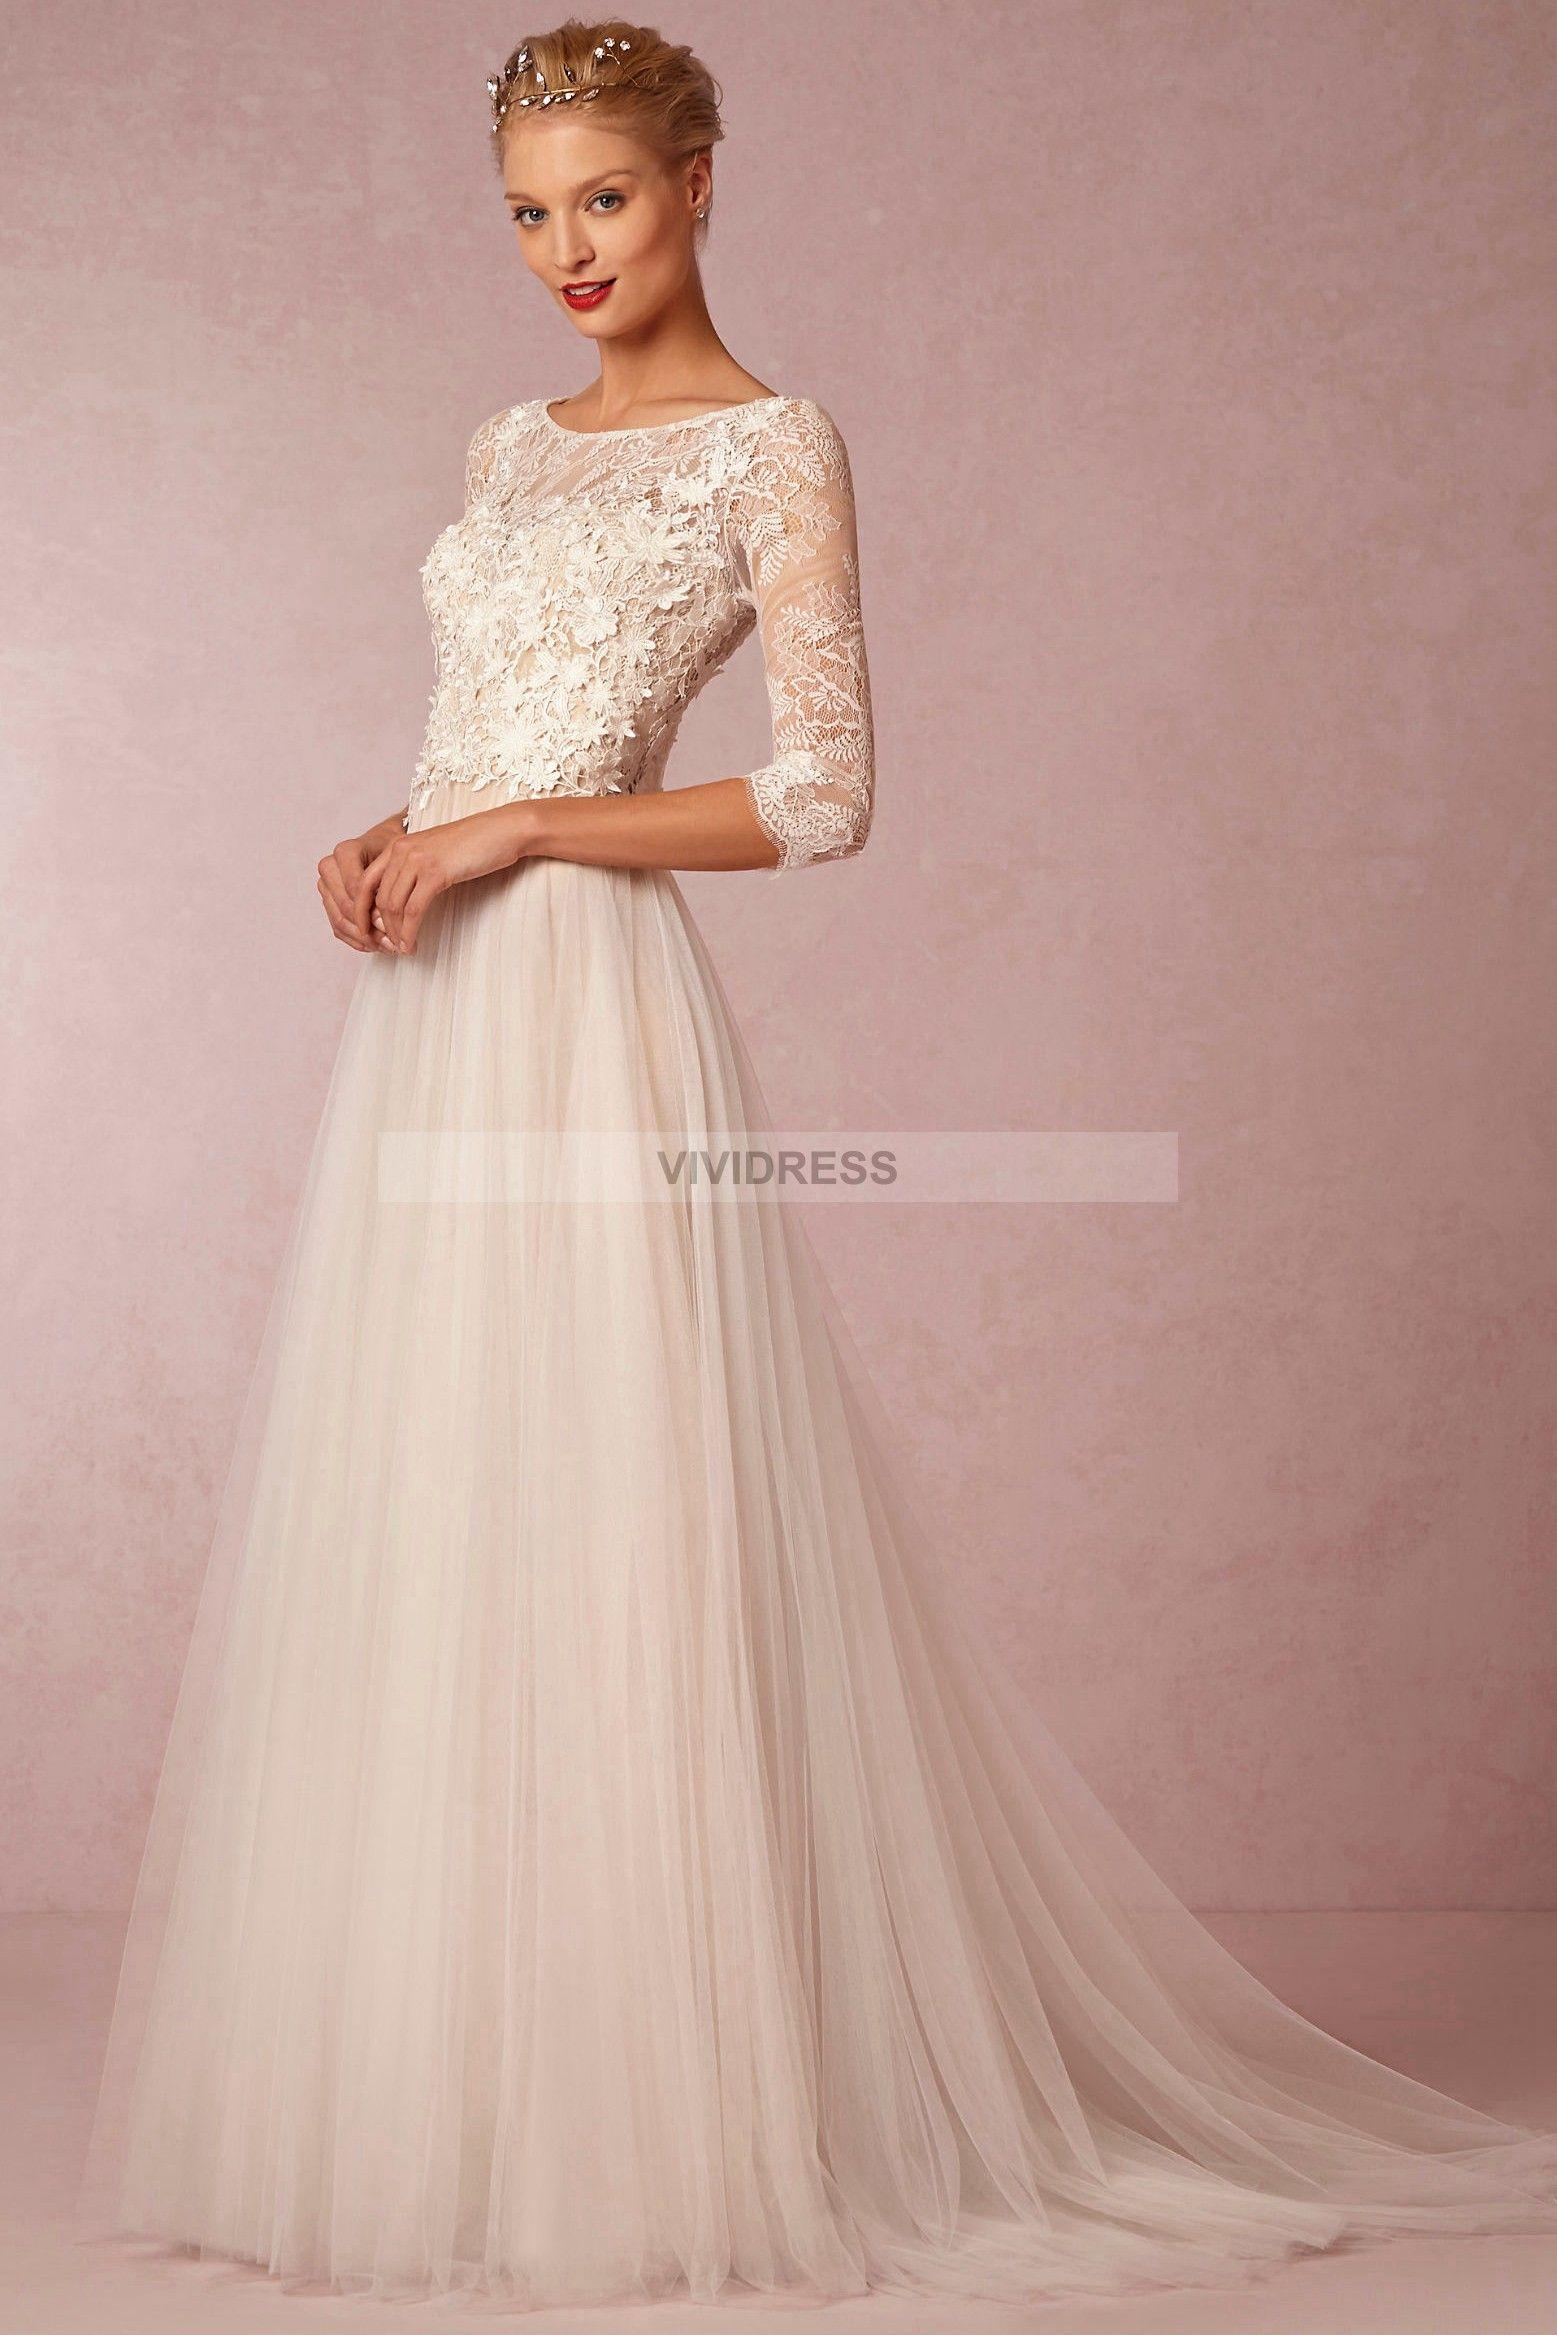 3 4 sleeve lace wedding dress  Aline Scoop Court Train Length Sleeve Lace Wedding Dresses UK